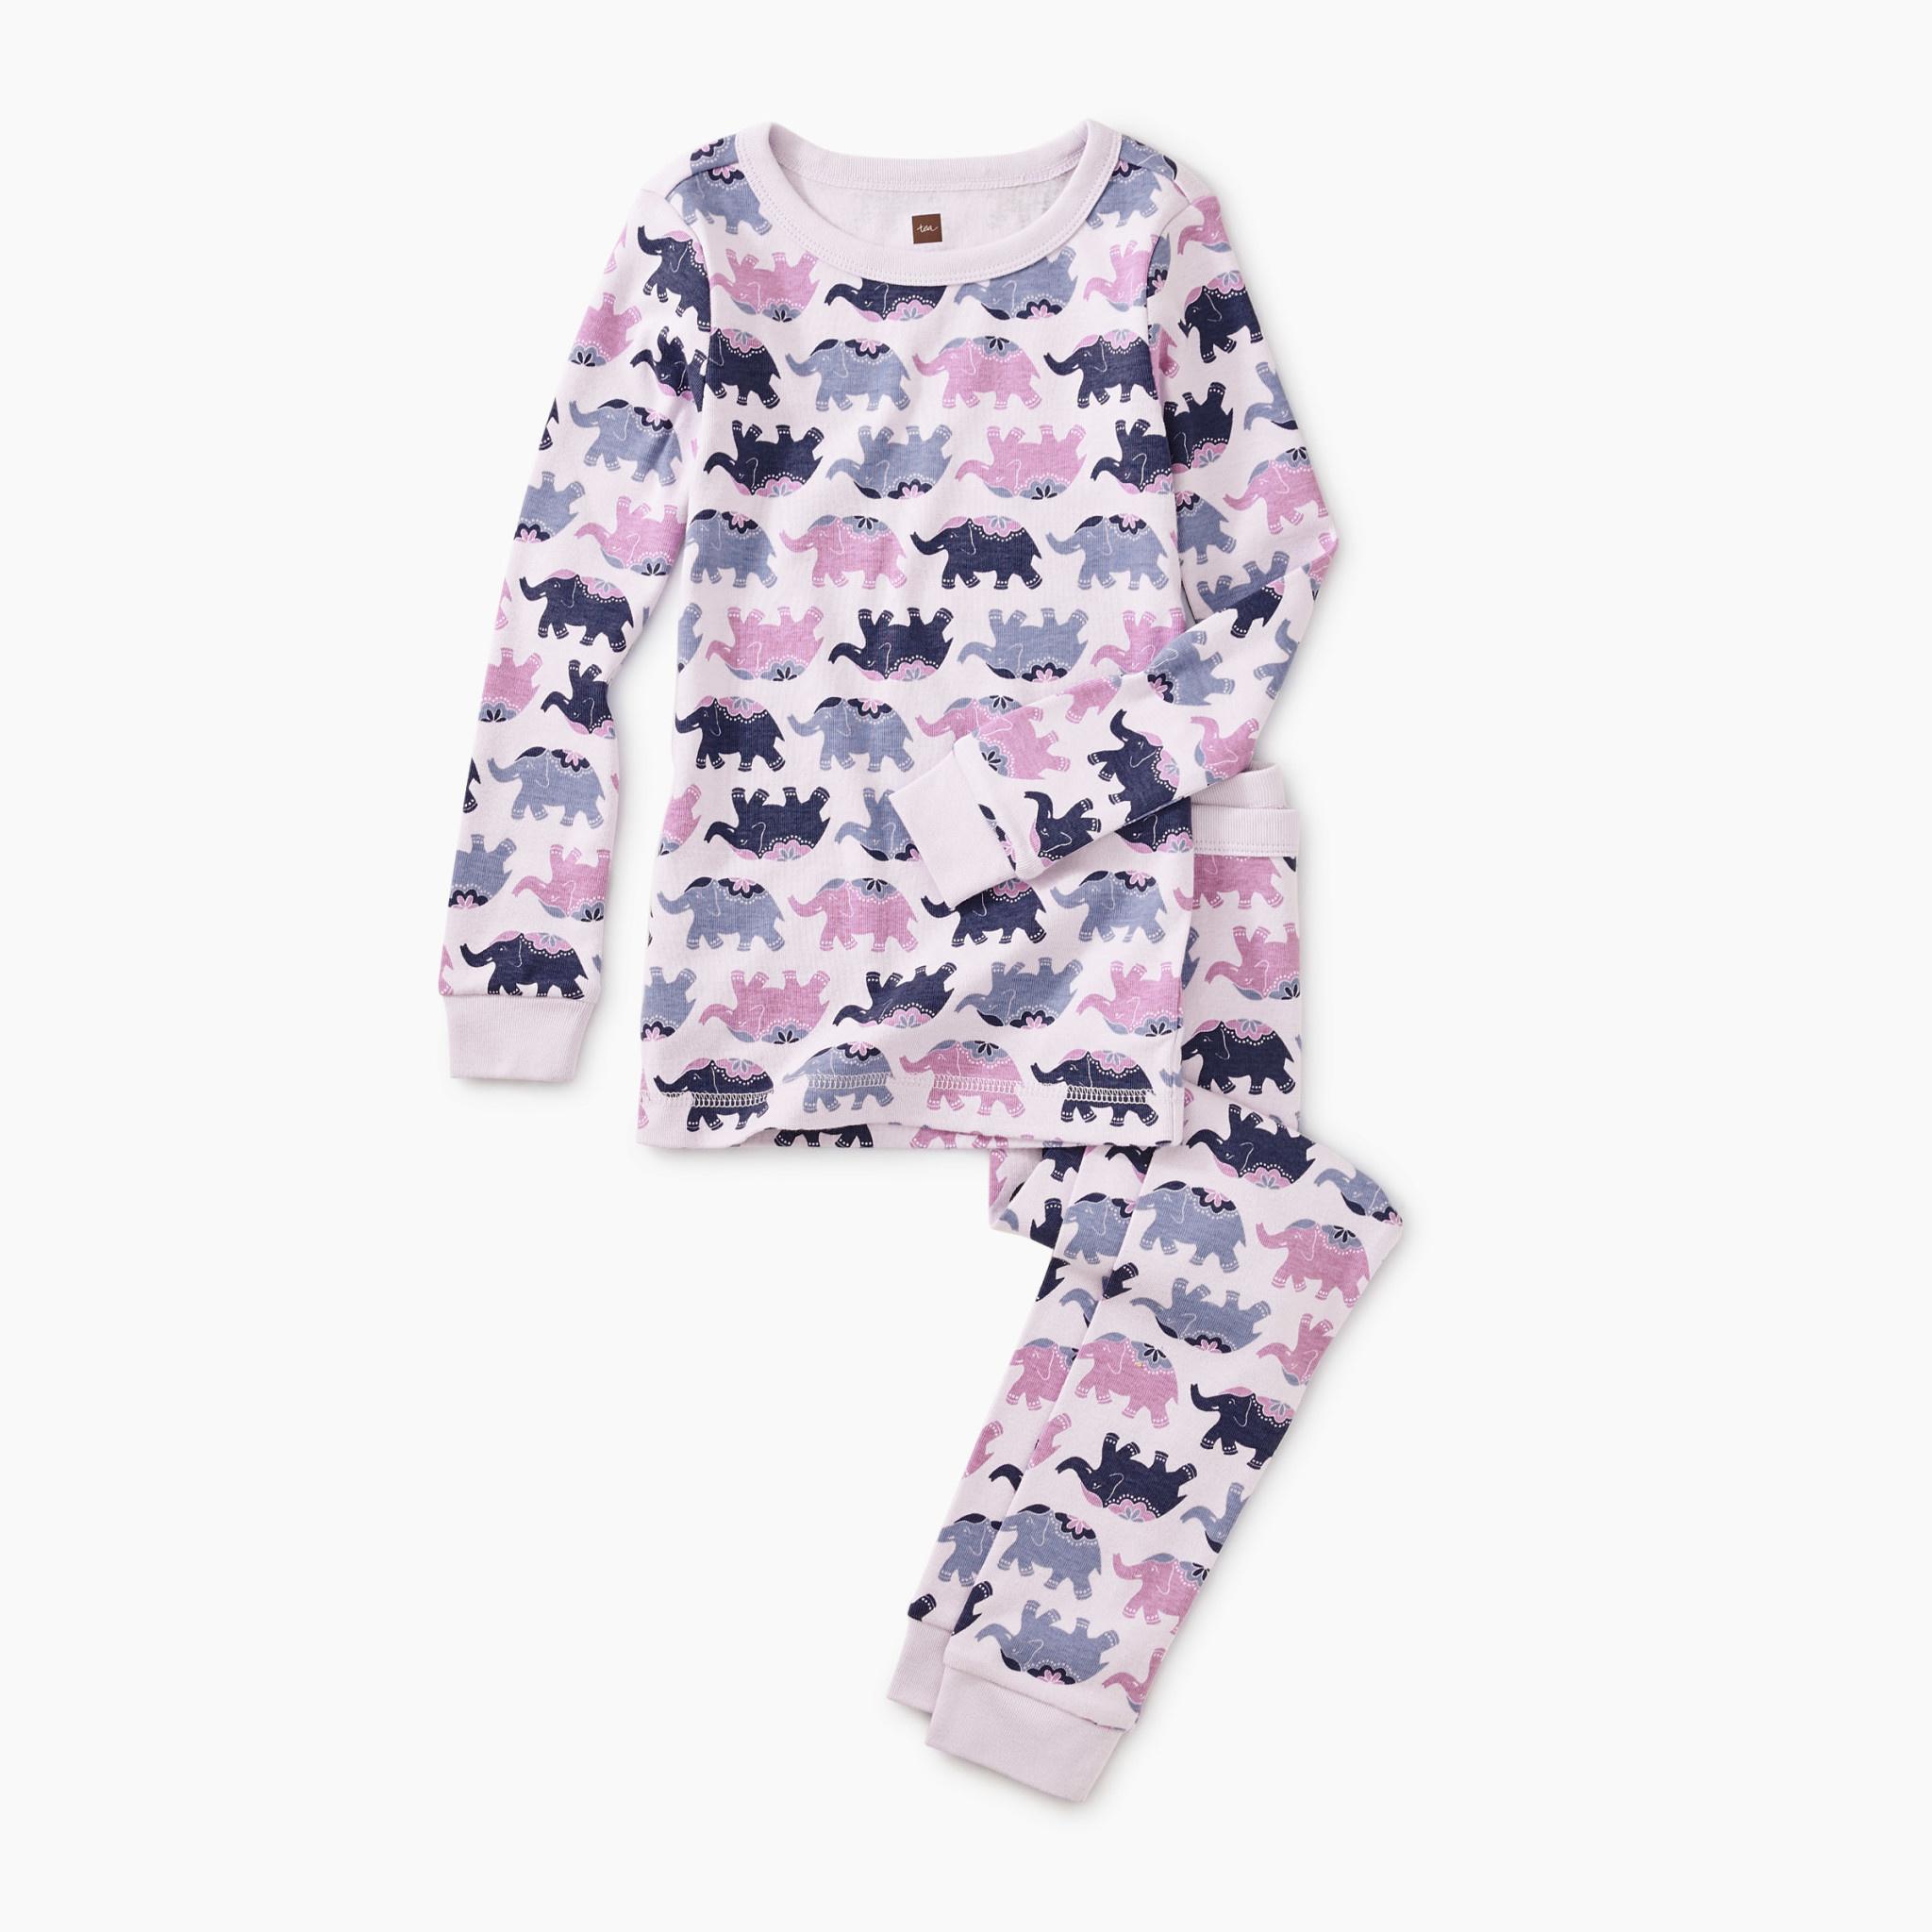 Tea Collection Elephant Elegance Pajamas